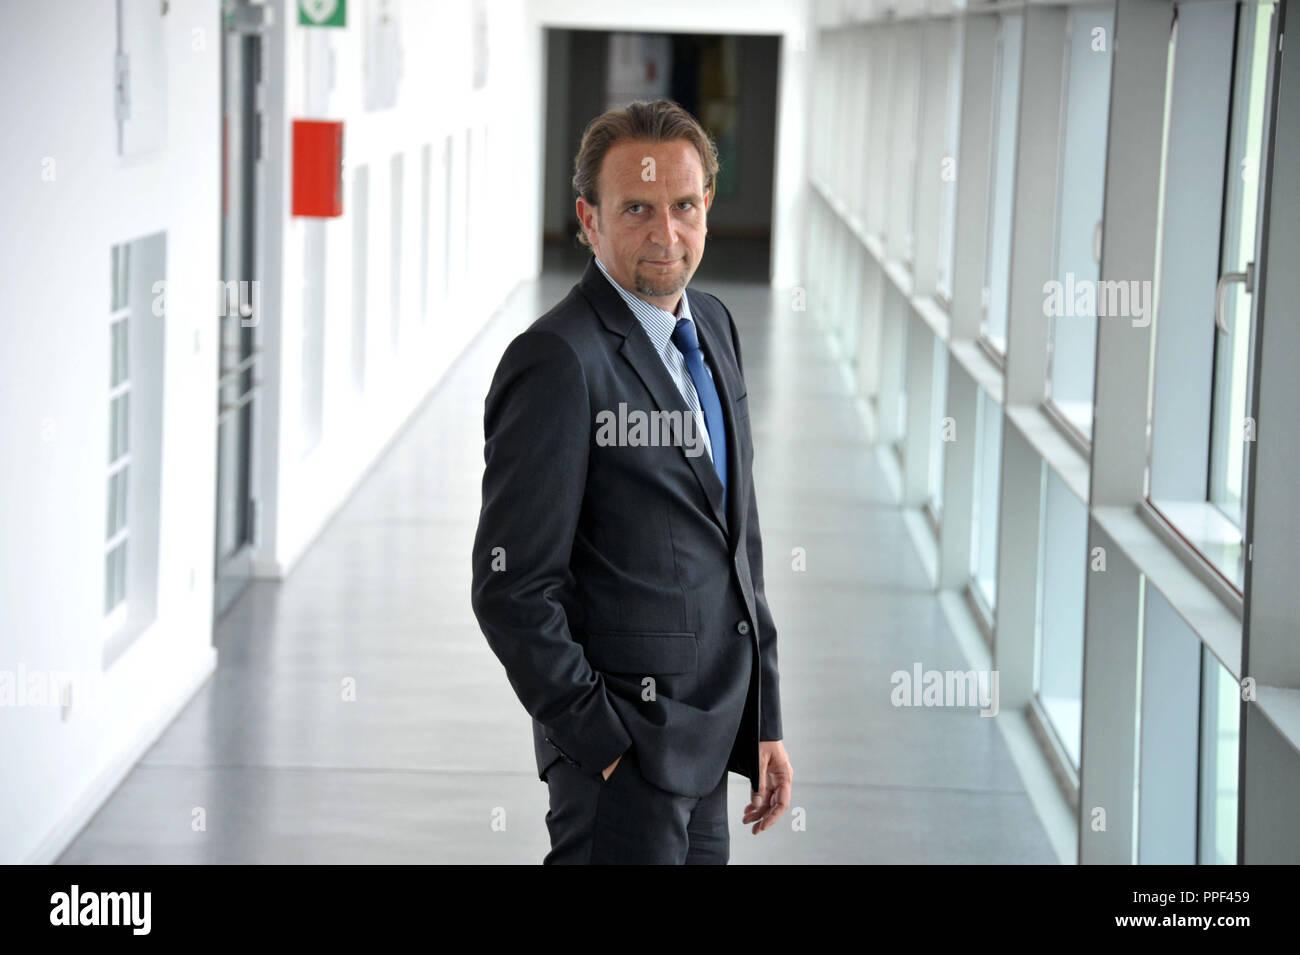 Mario Huber, head of the mafia investigators at the Bavarian Land Office of Criminal Investigation. - Stock Image